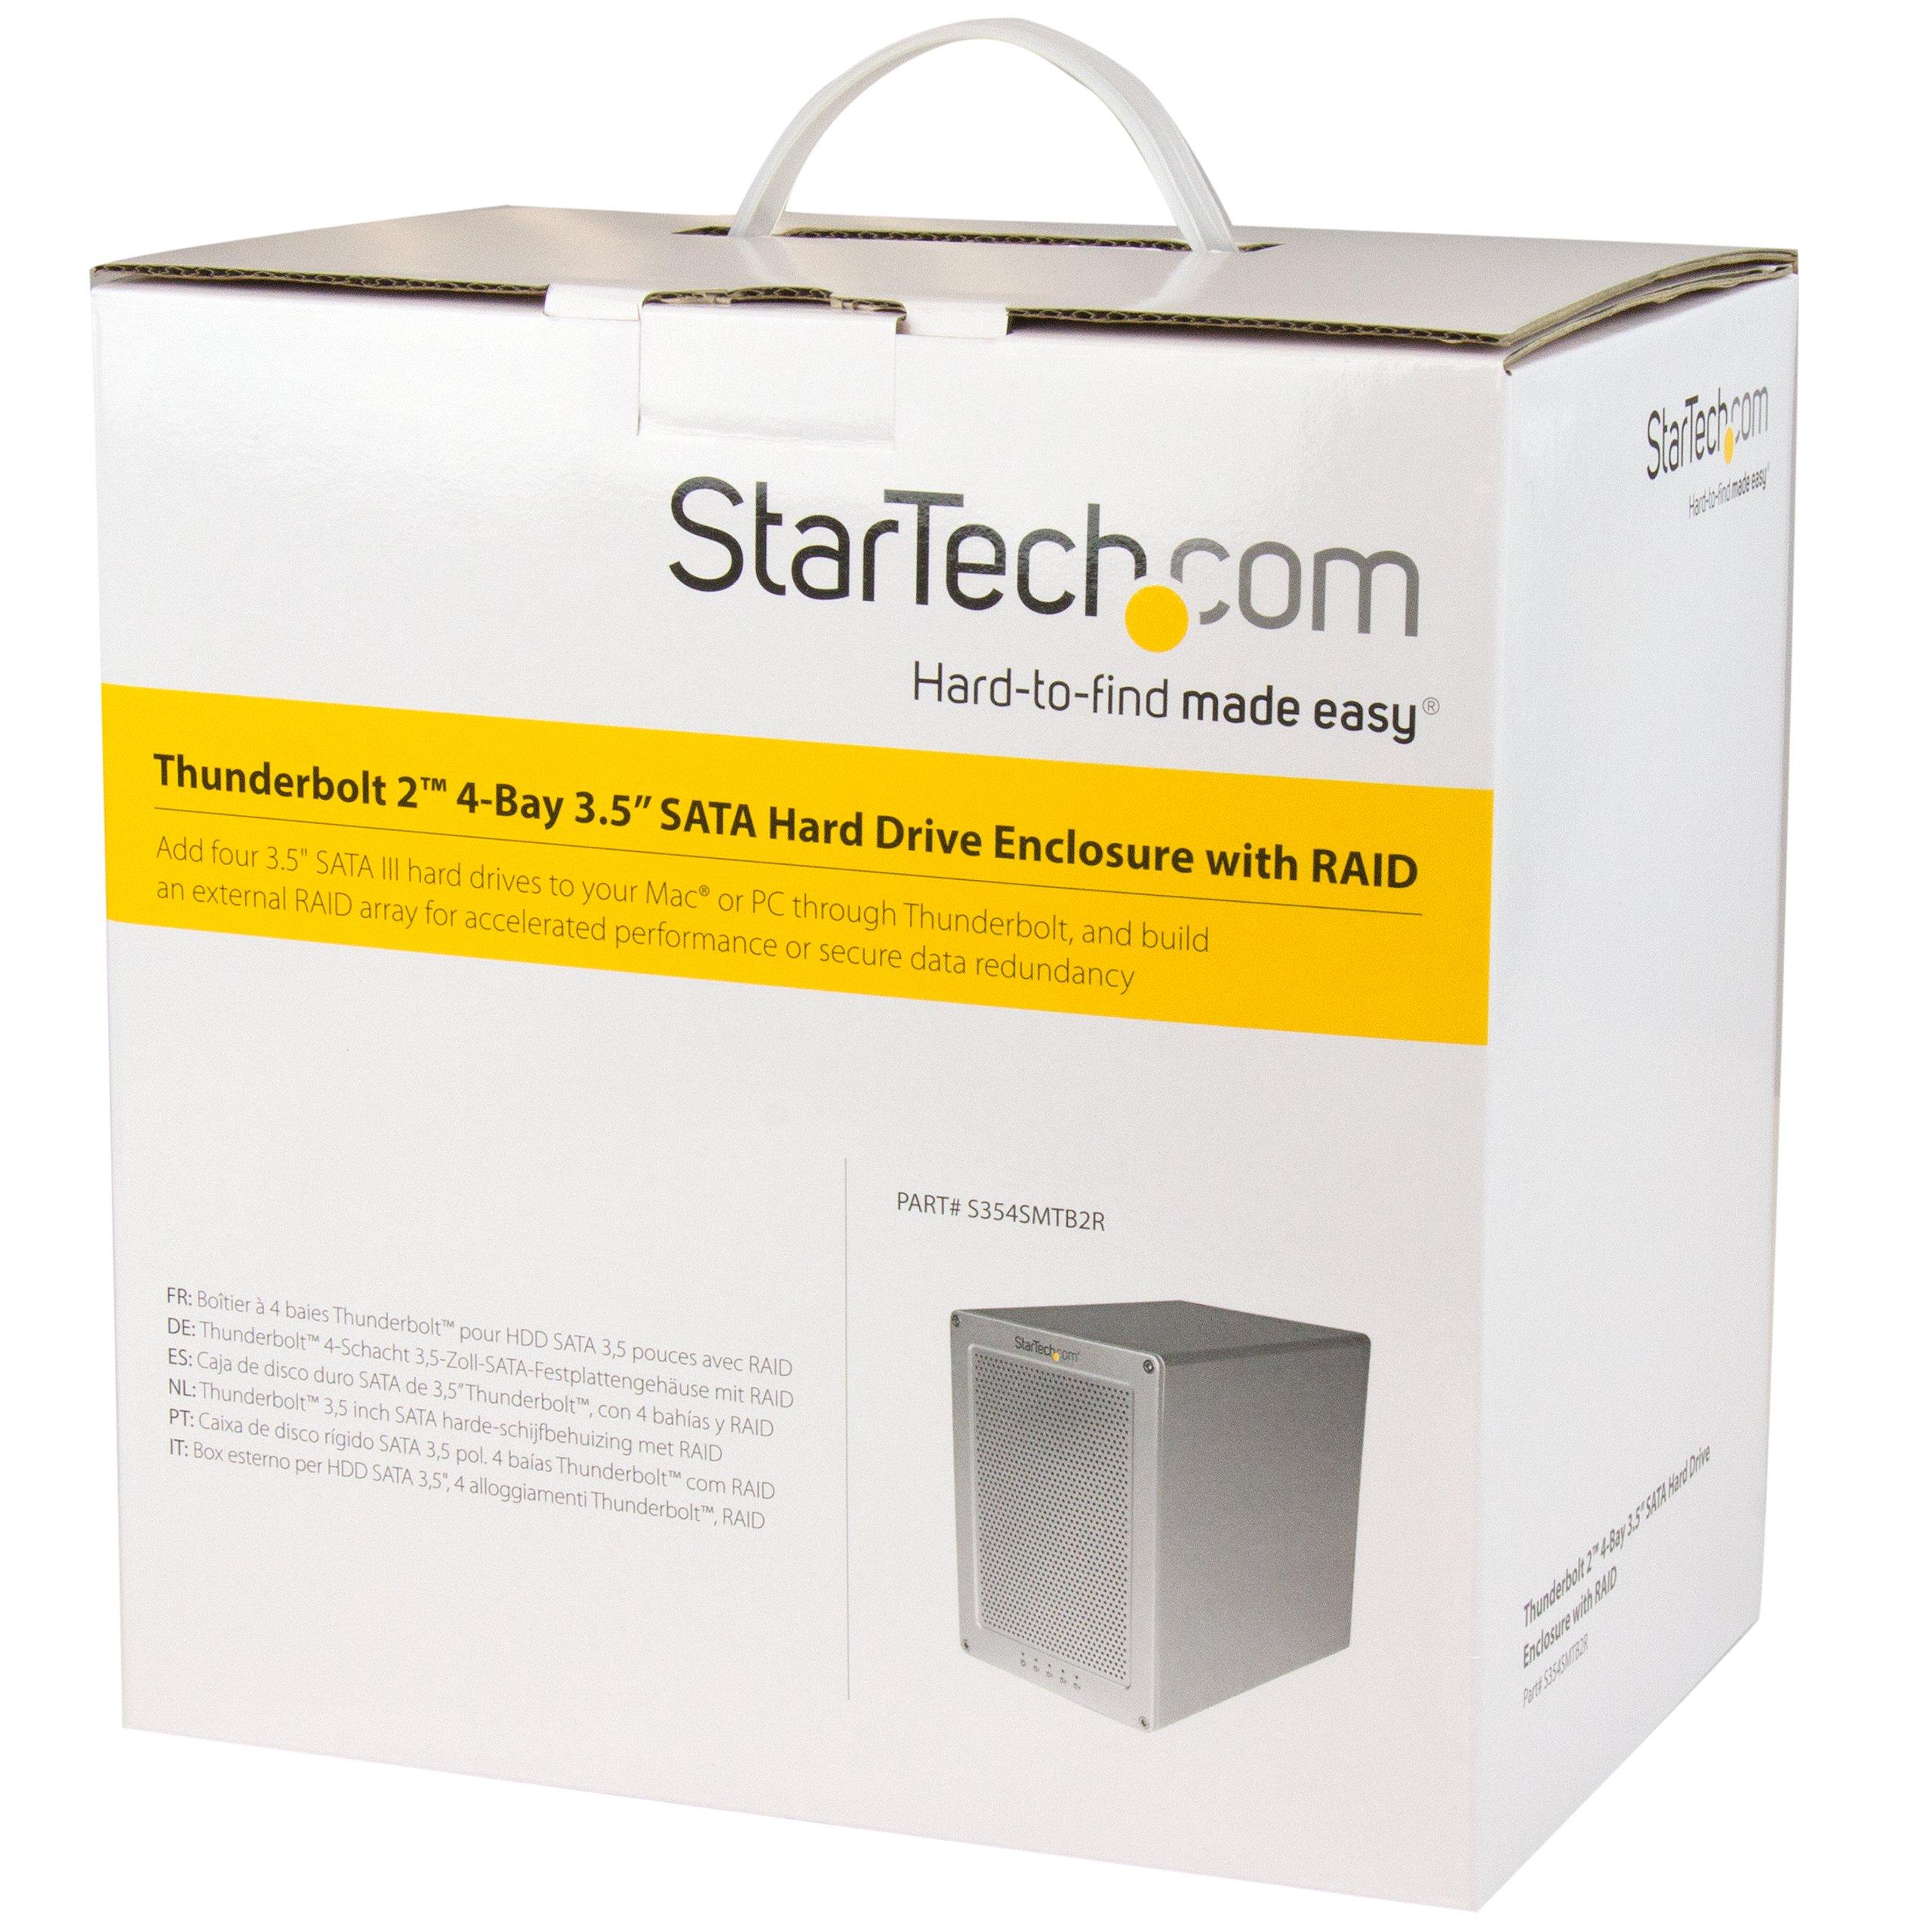 StarTech.com S354SMTB2R - Caja Thunderbolt 2 con 4 bahías Raid de 3.5